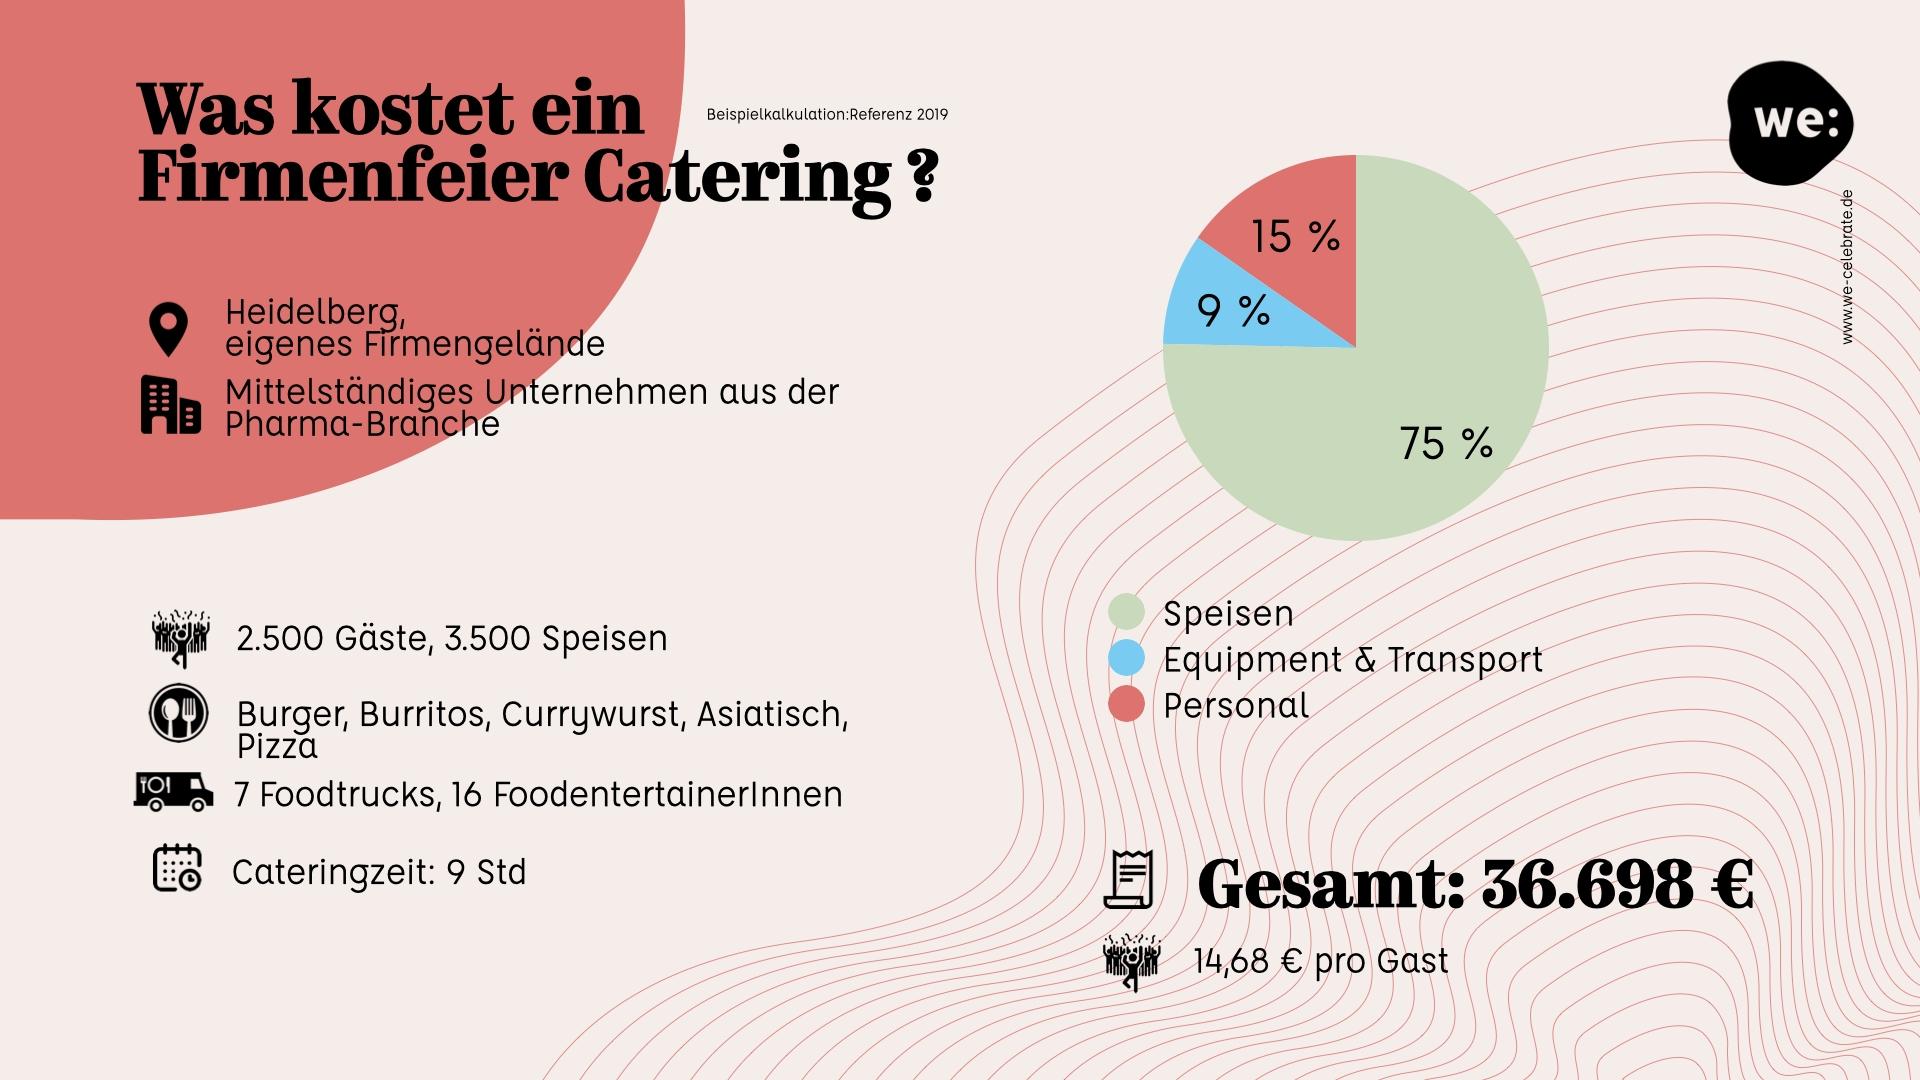 Kosten Firmenfeier Catering Heidelberg